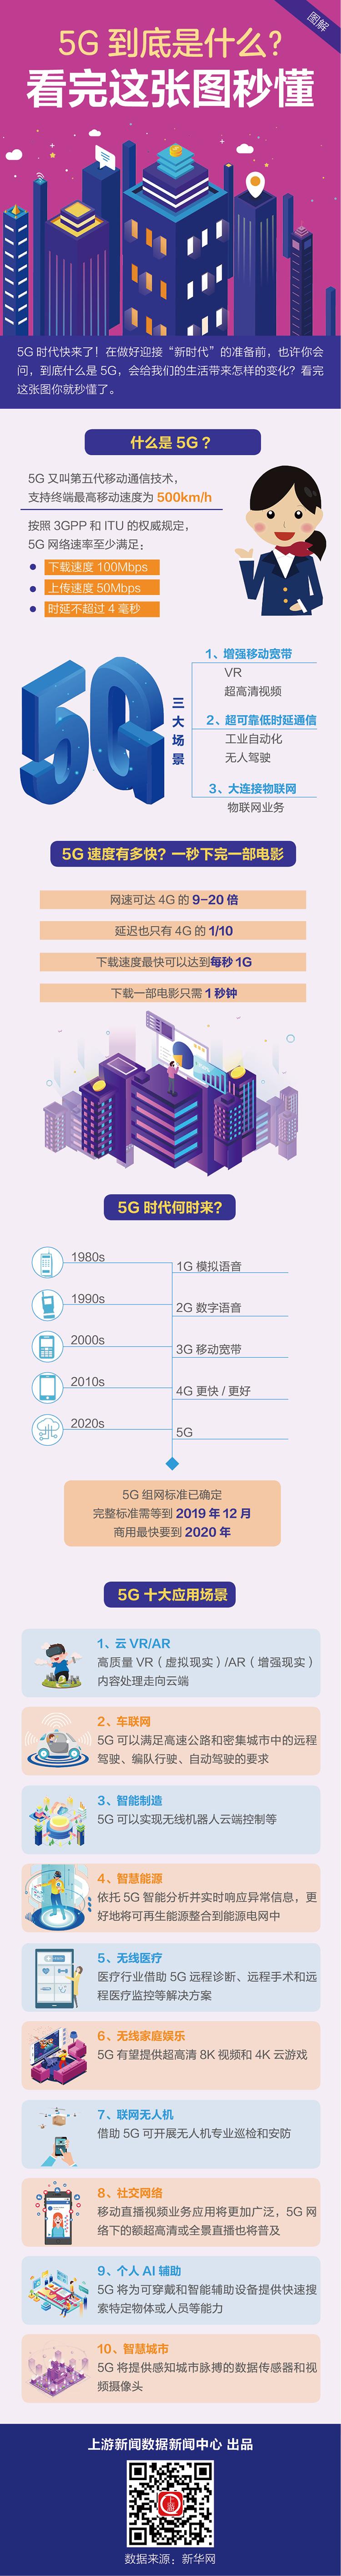 5G图解.jpg